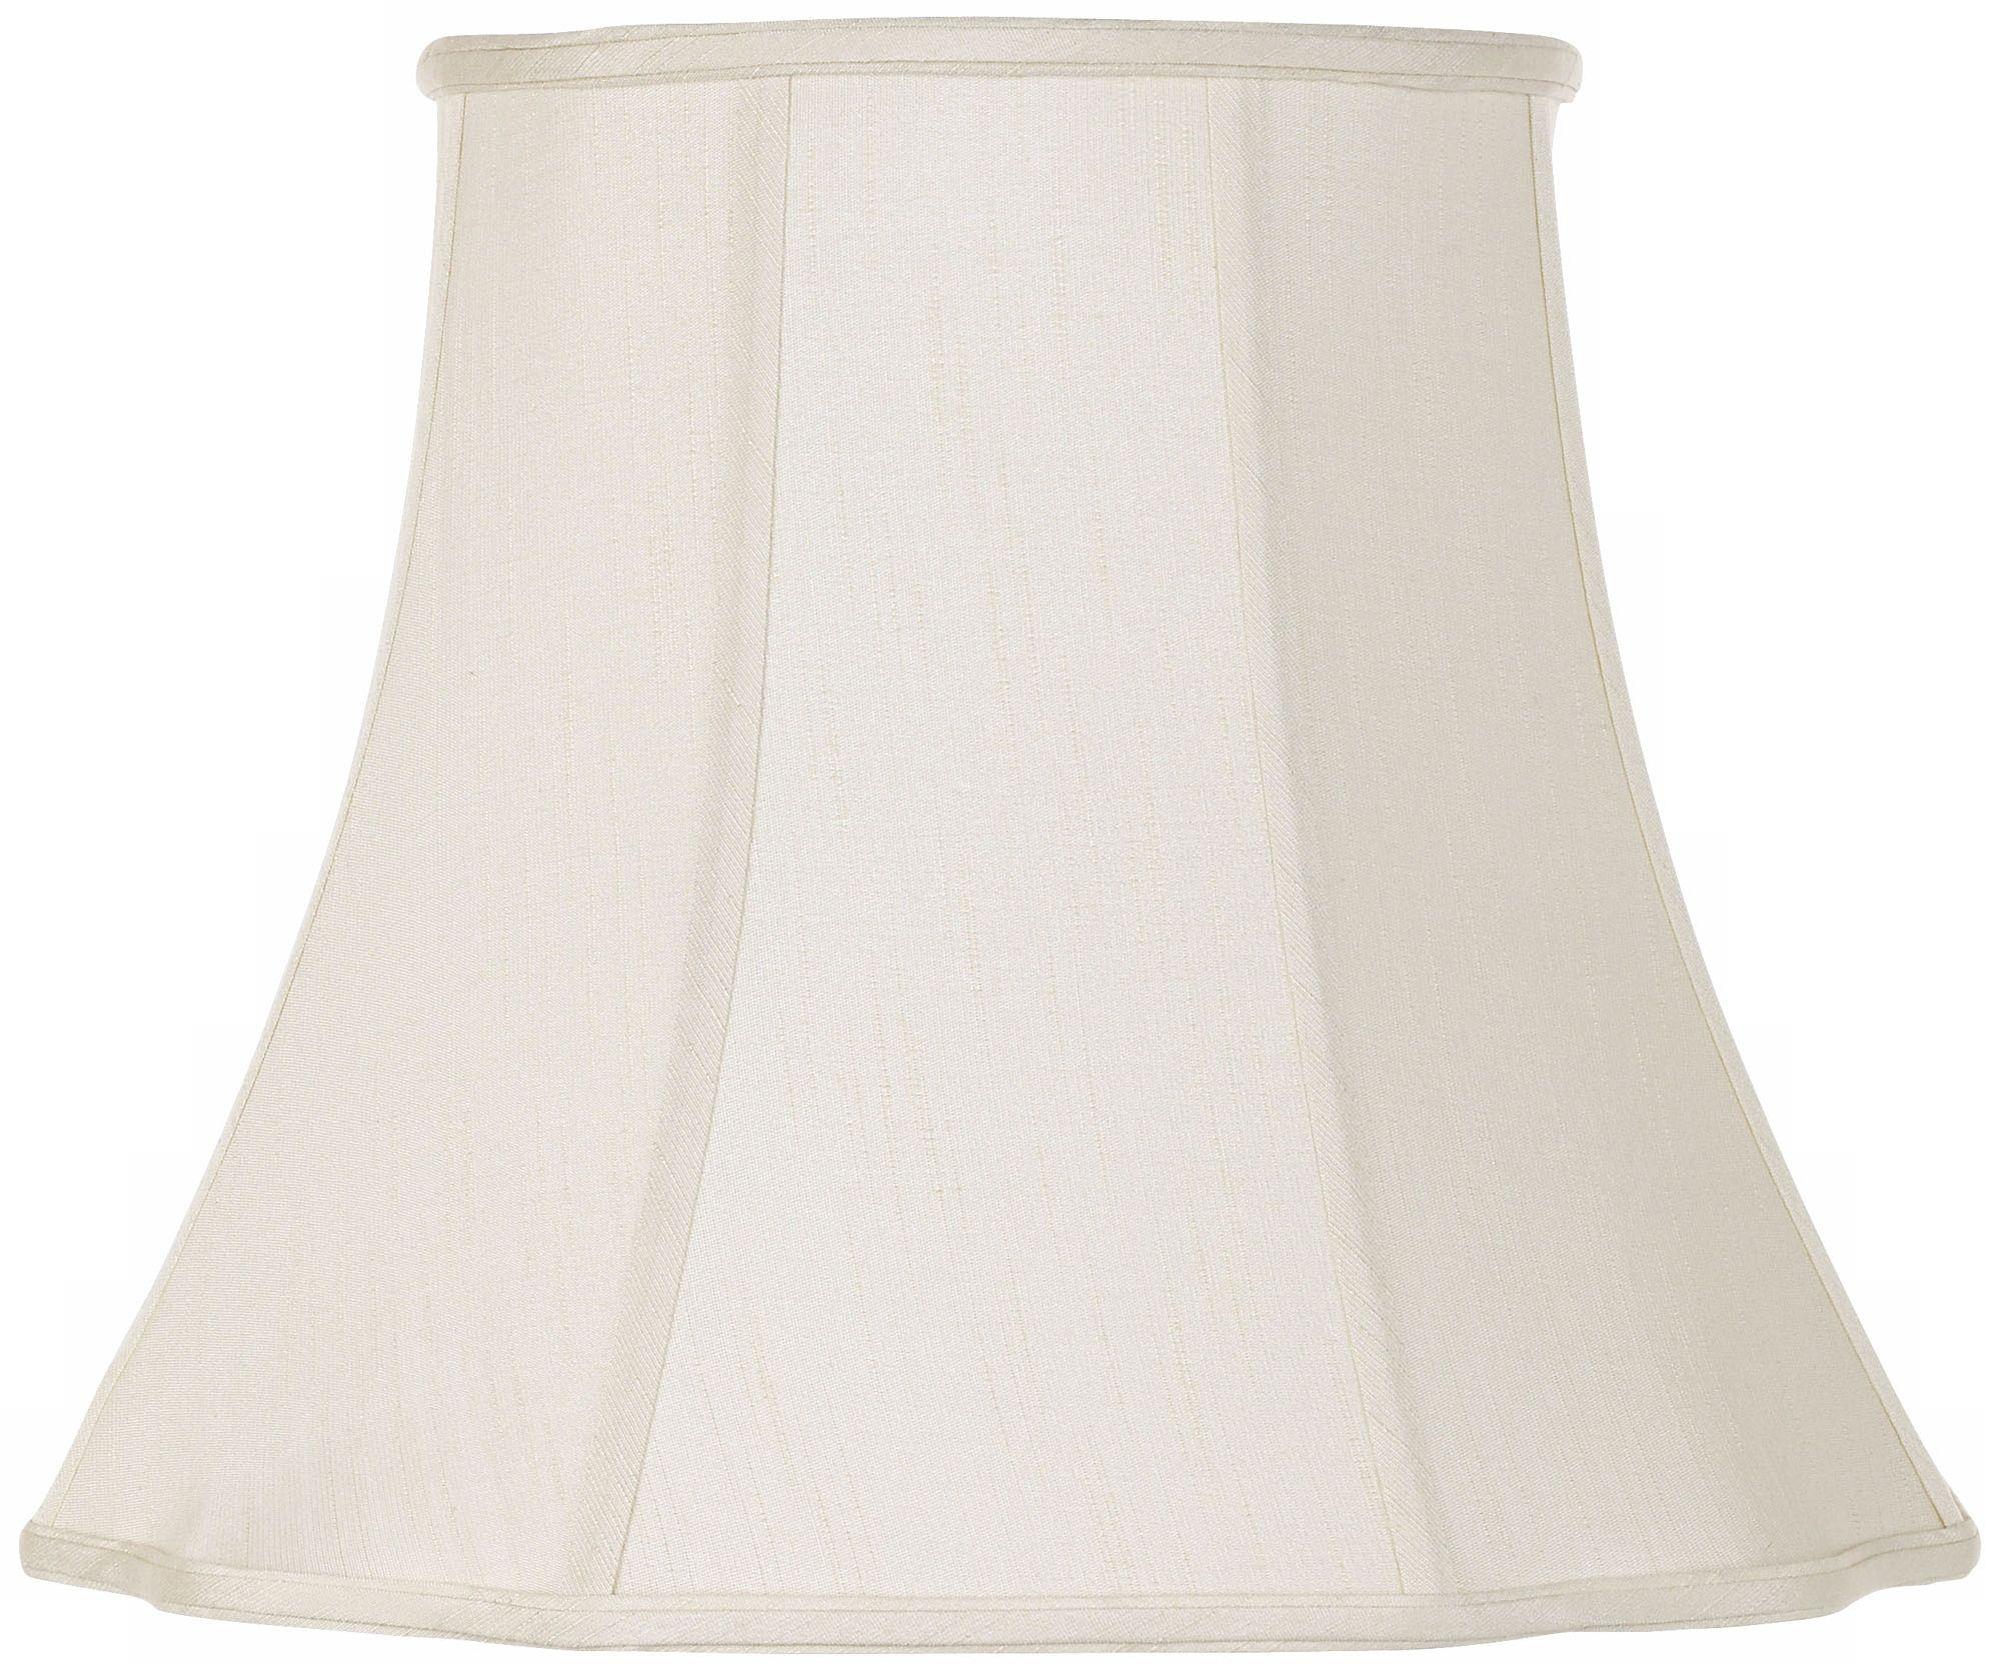 lamp shades creme bell curve cut corner lamp shade 11x18x15 (spider) PIAZRFF